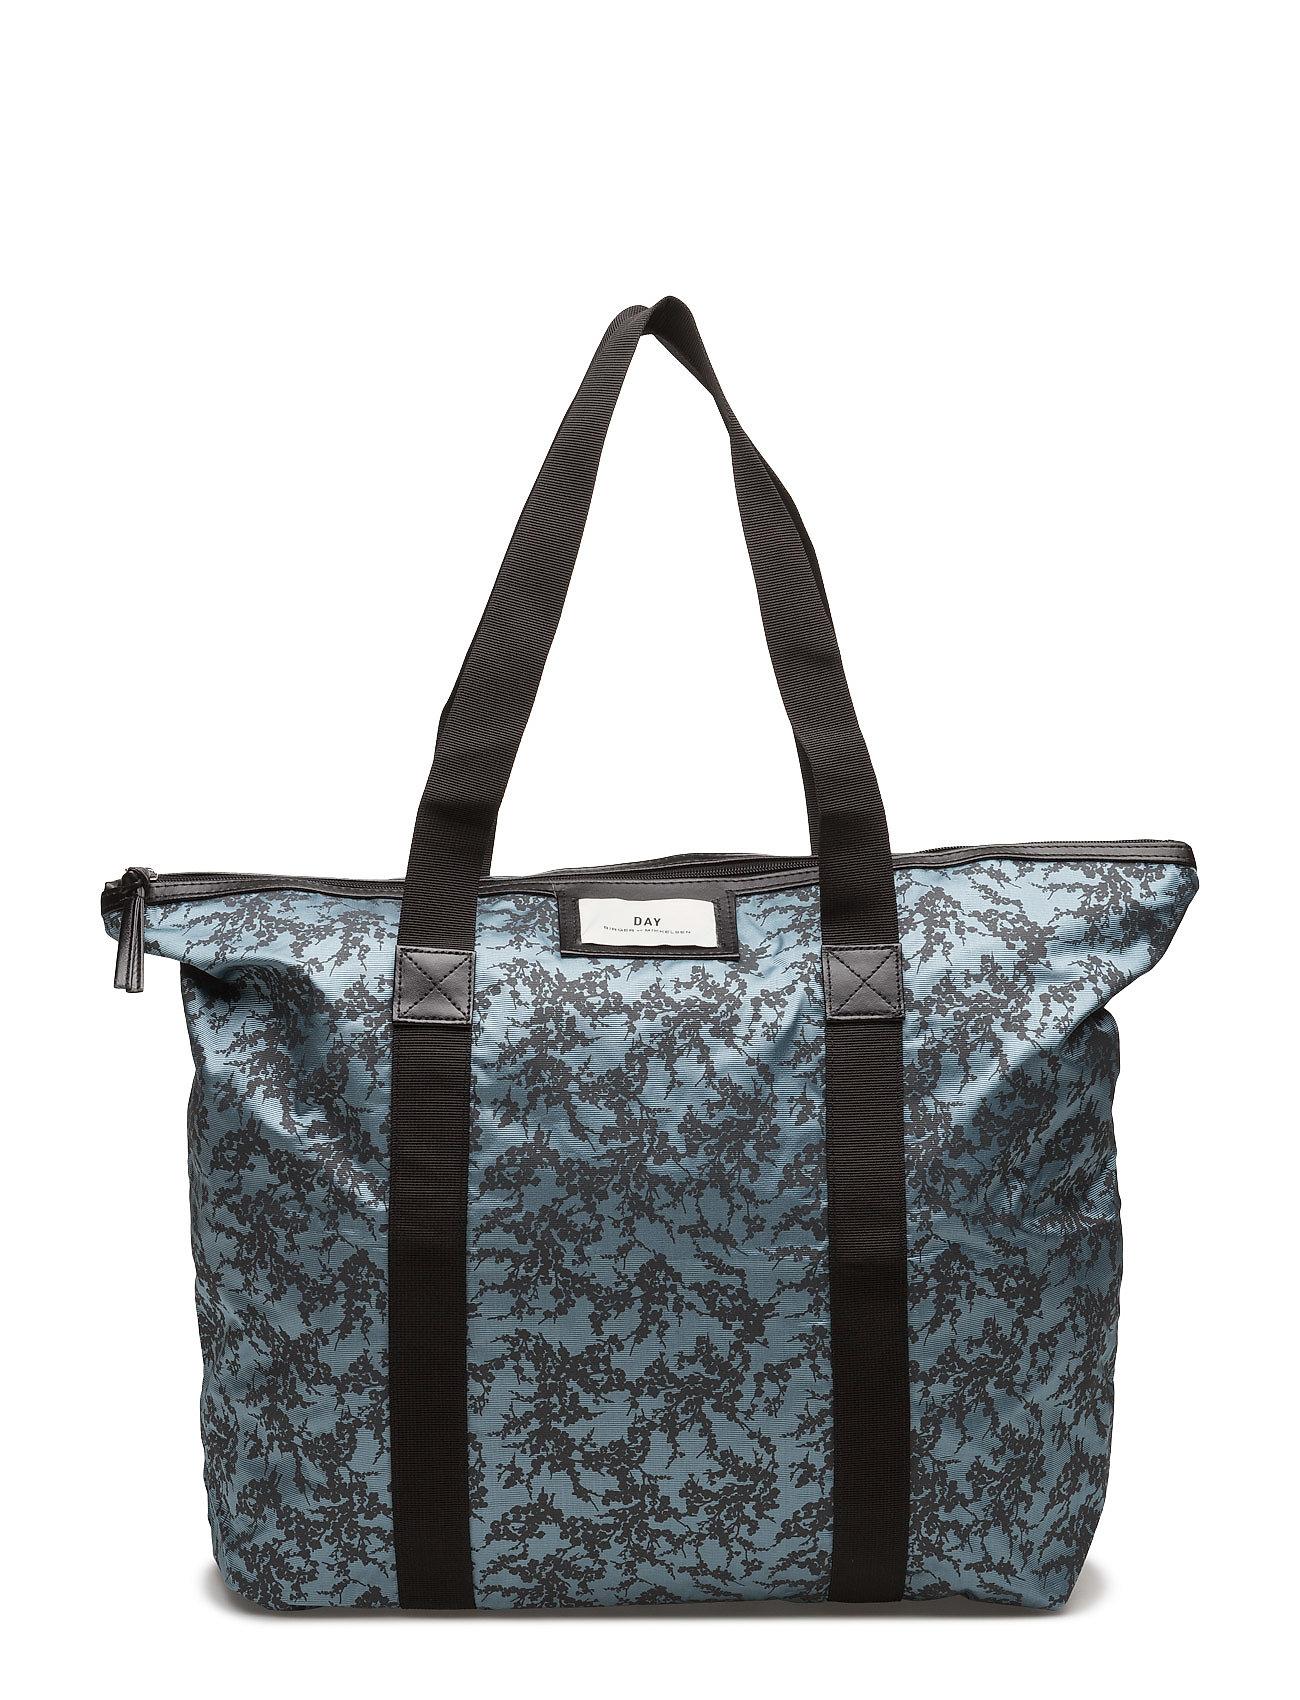 DAY et Day Gweneth P Malus Bag